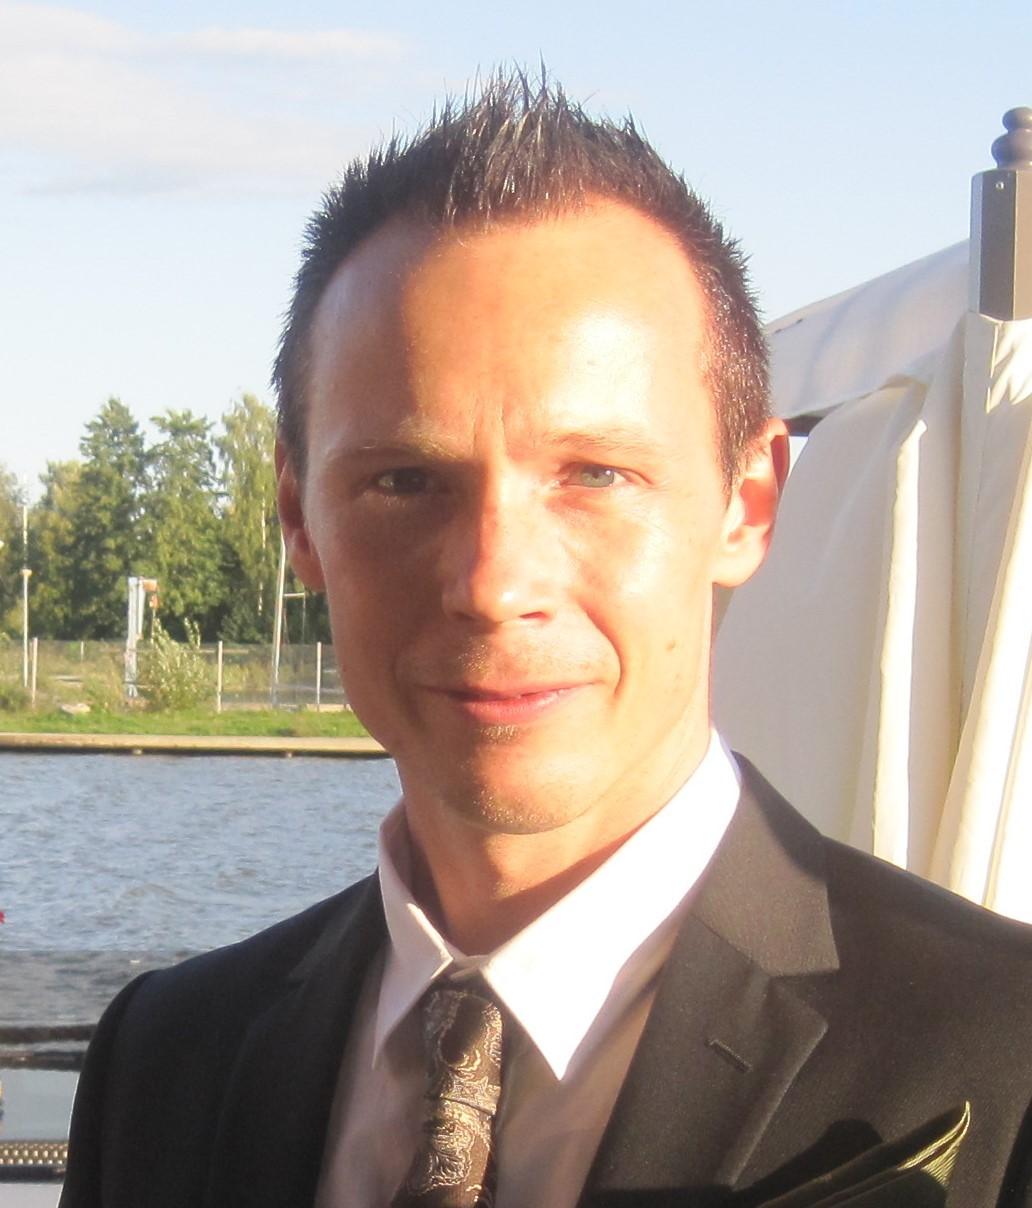 Kund och Logistikchef i Sverige